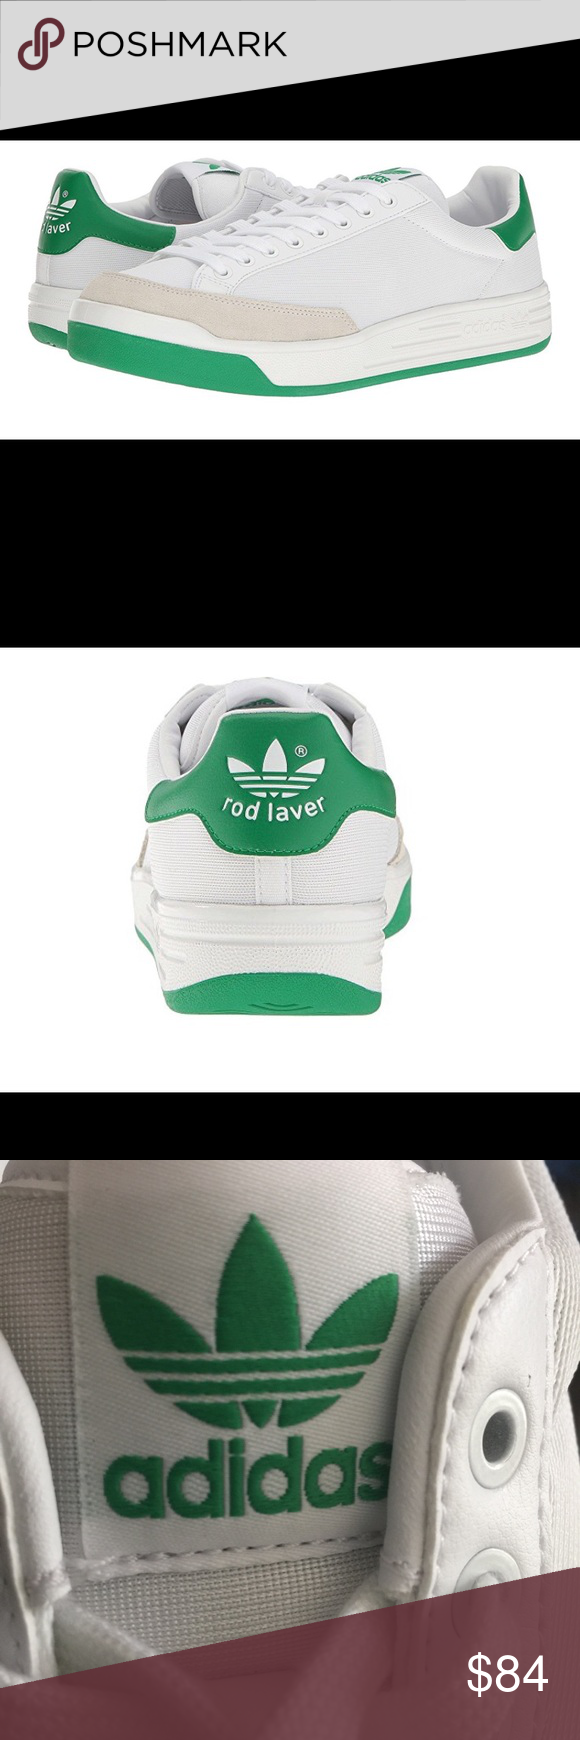 NWT Adidas Mens Rod Laver Shoes Sz 9.5